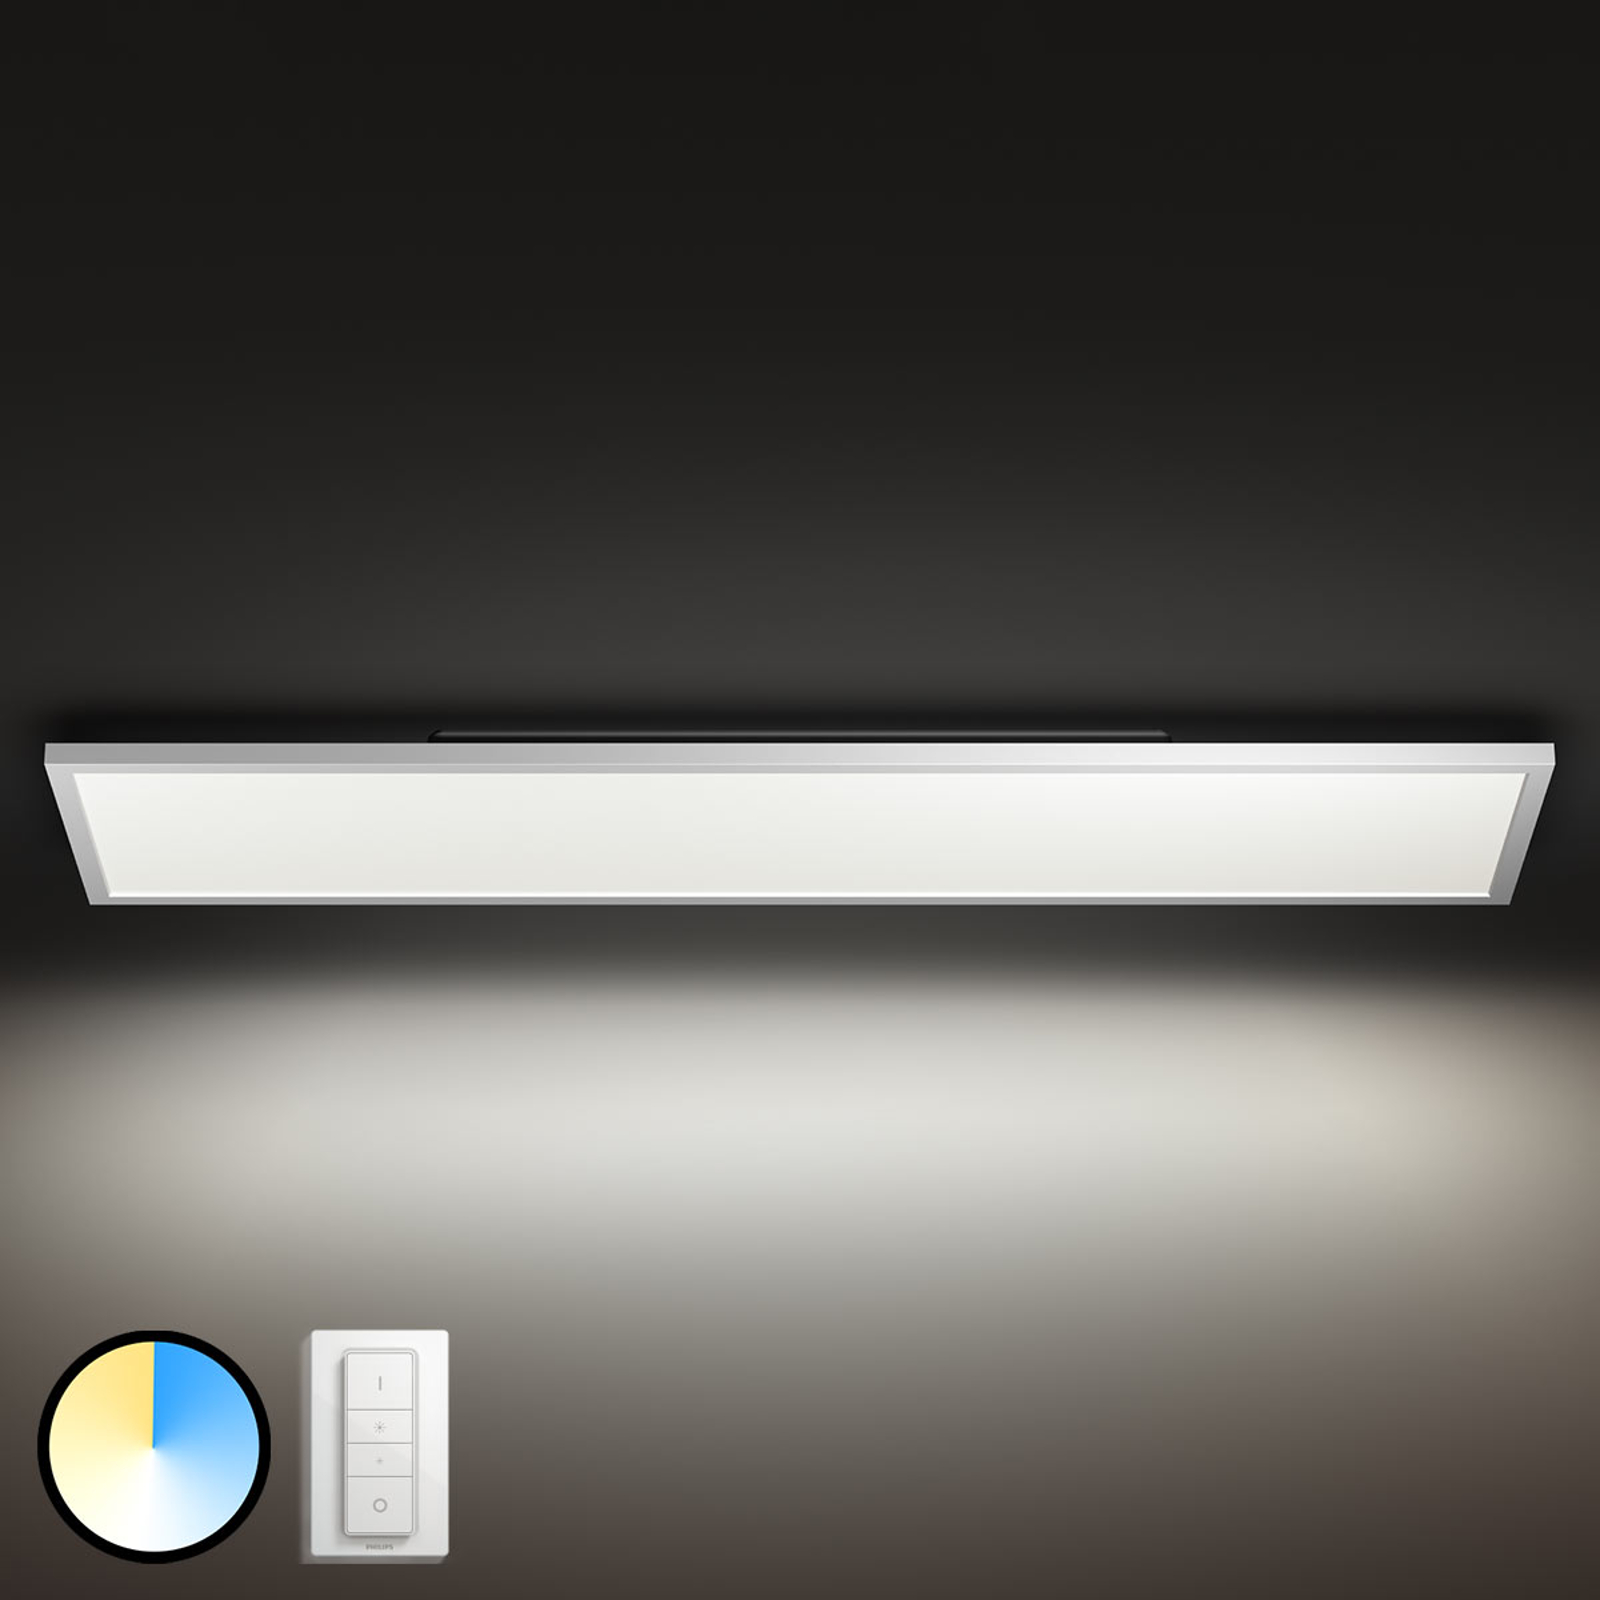 Philips Hue Aurelle LED paneel hoekig, 120 x 30 cm